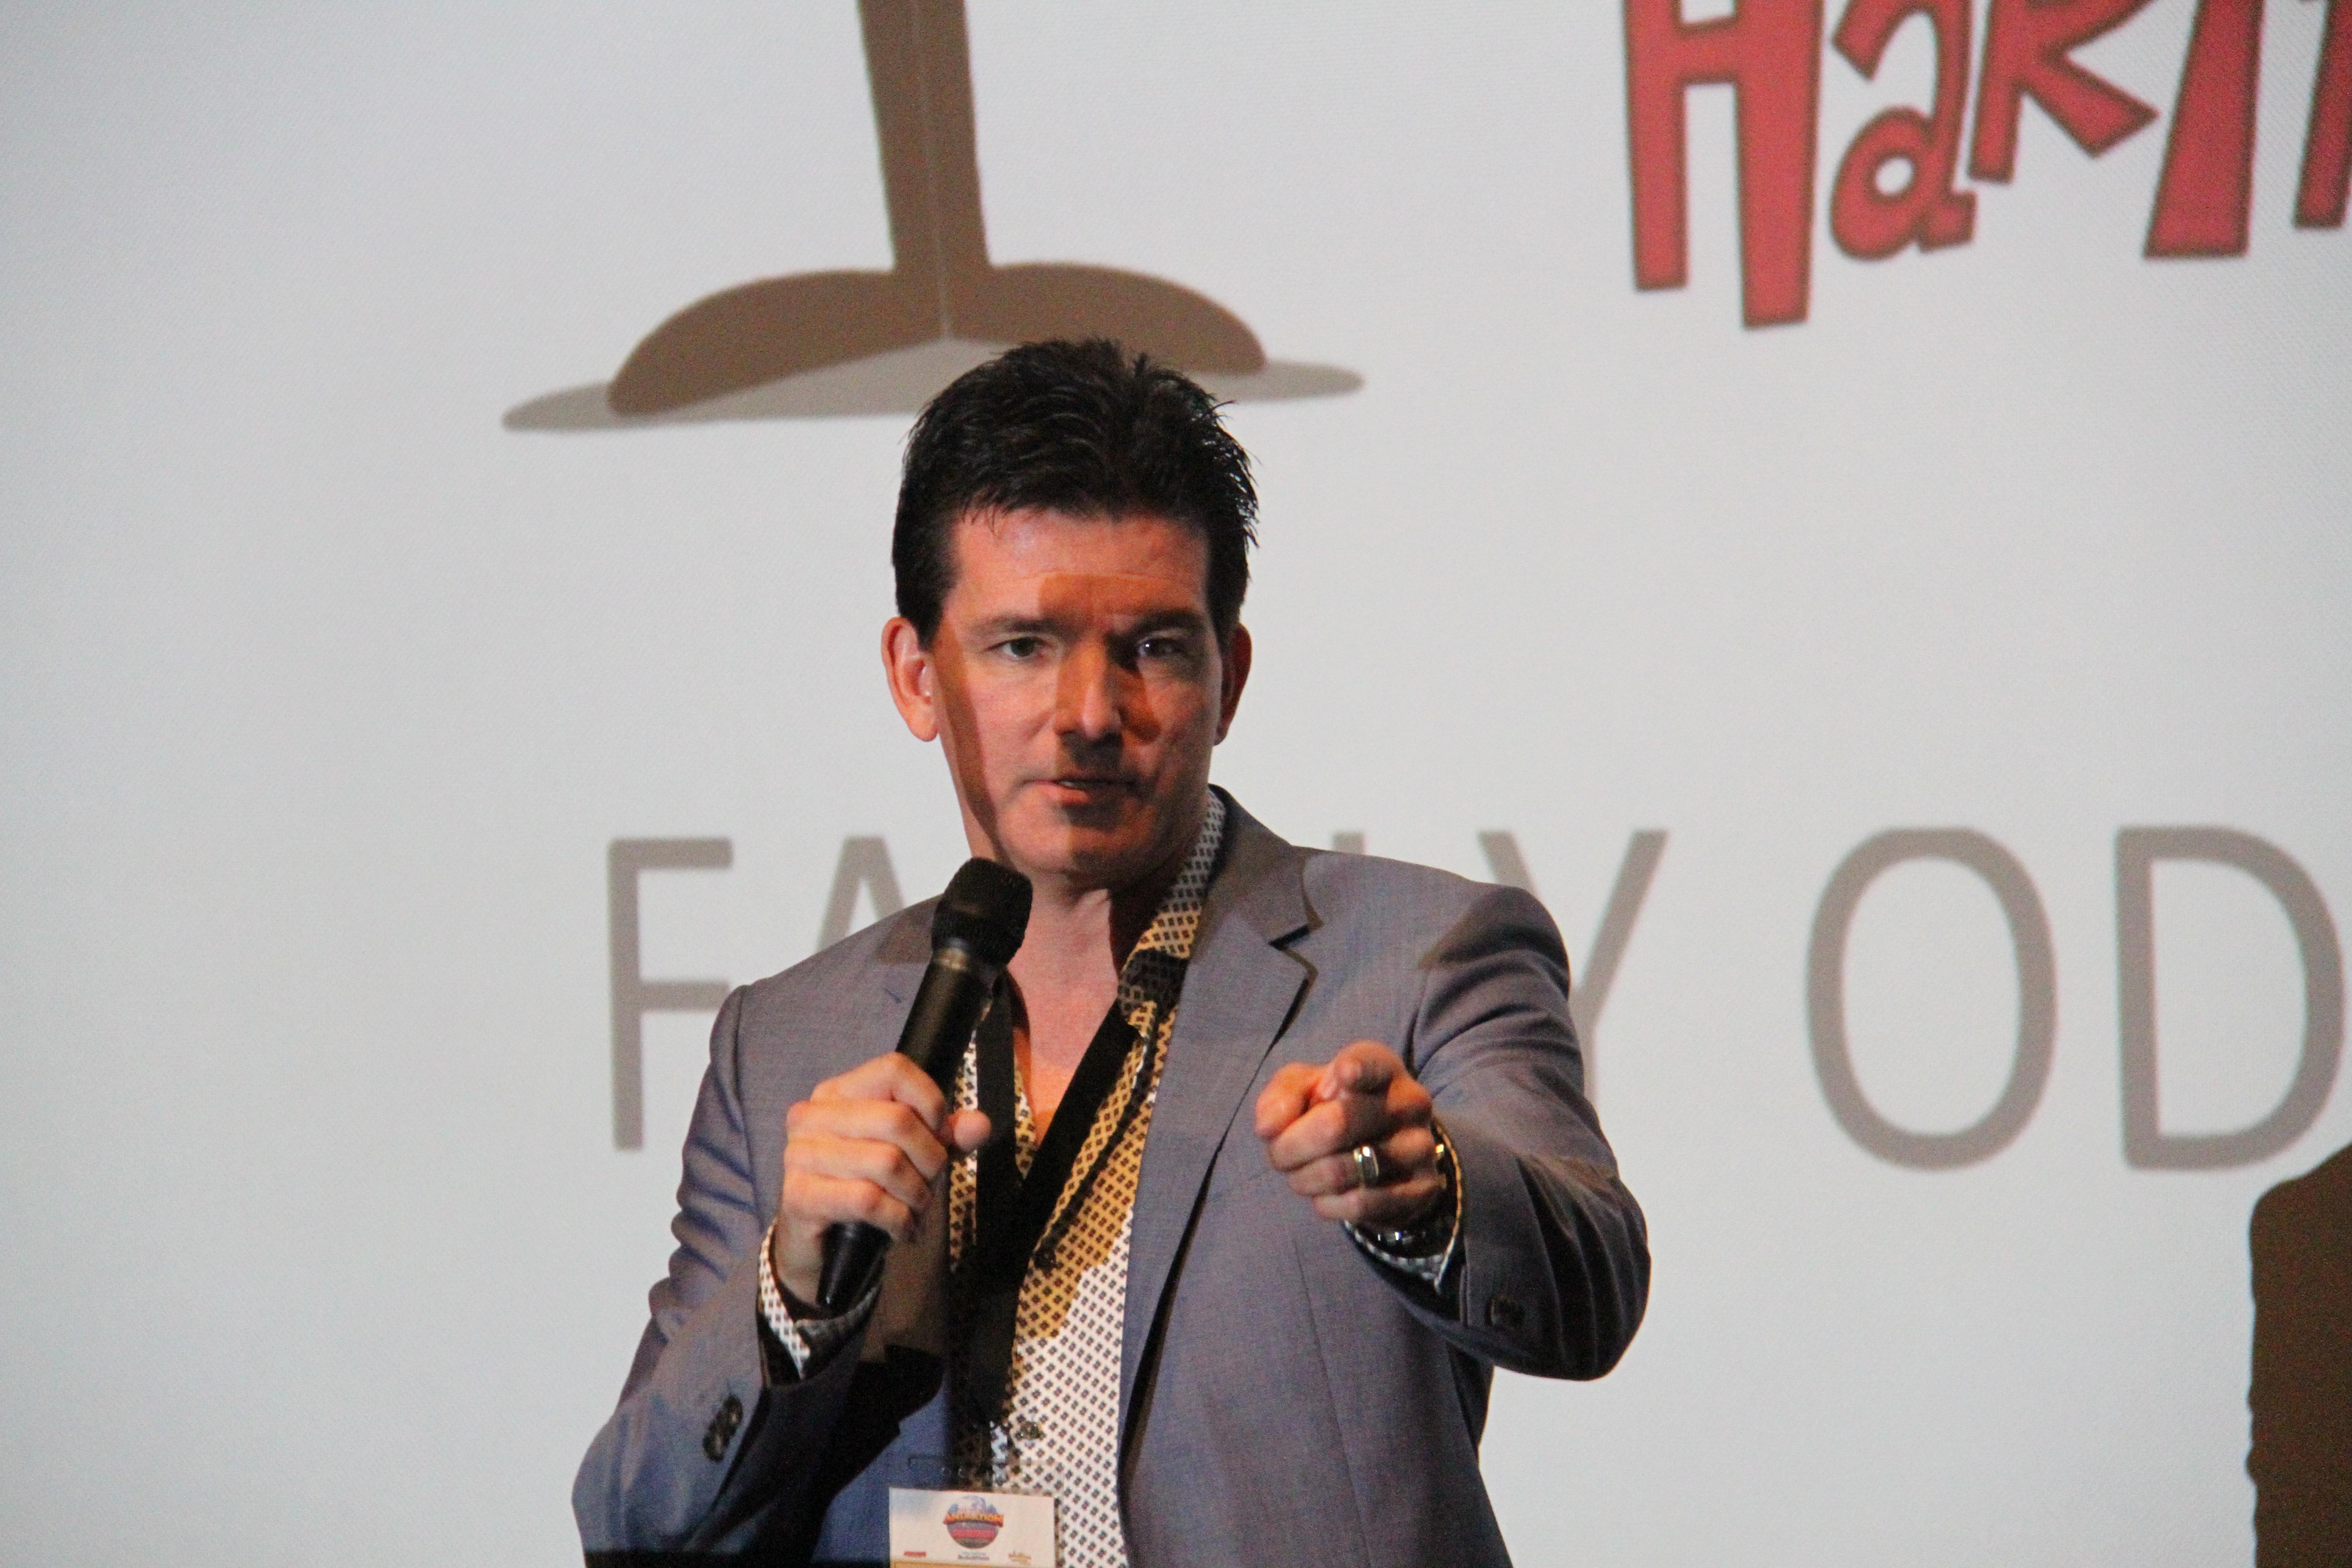 Guest Speaker Butch Hartman